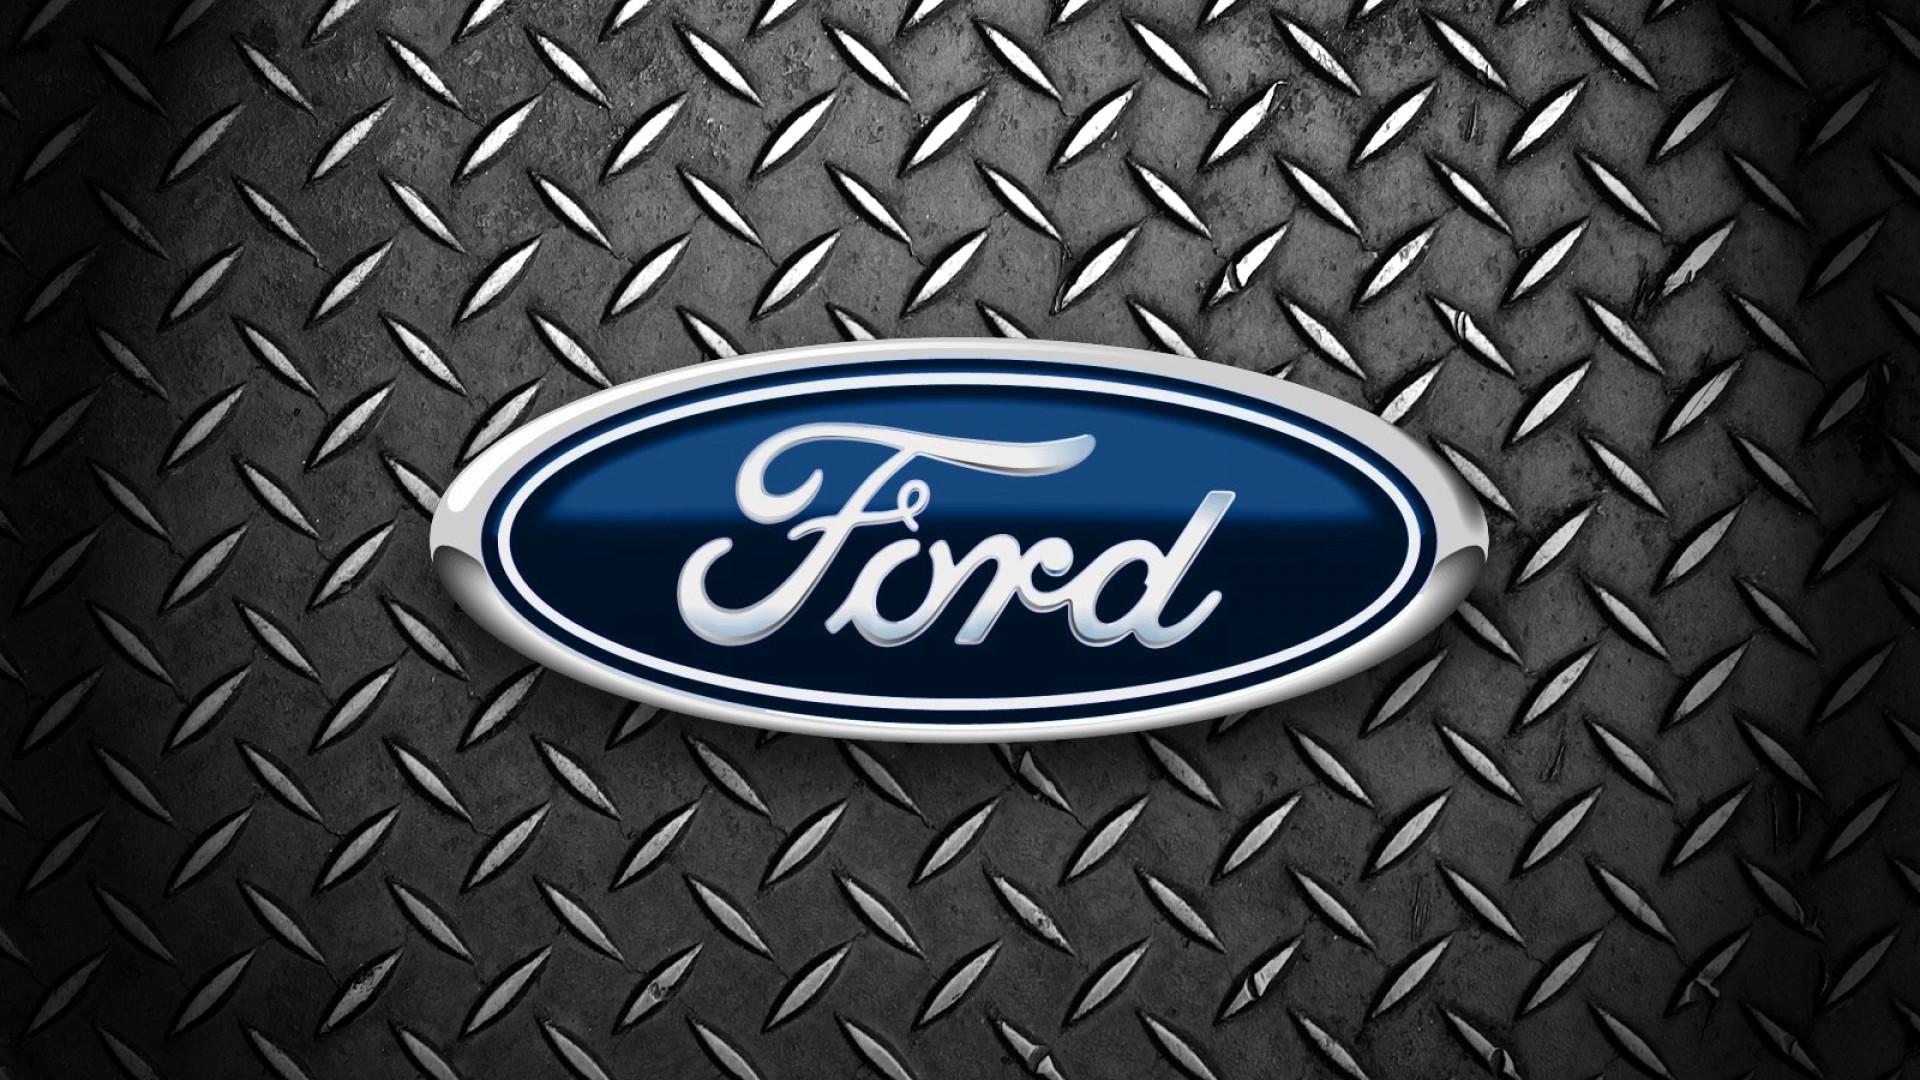 Motor Company Logo HD Wallpaper wallpapers55com   Best Wallpapers 1920x1080